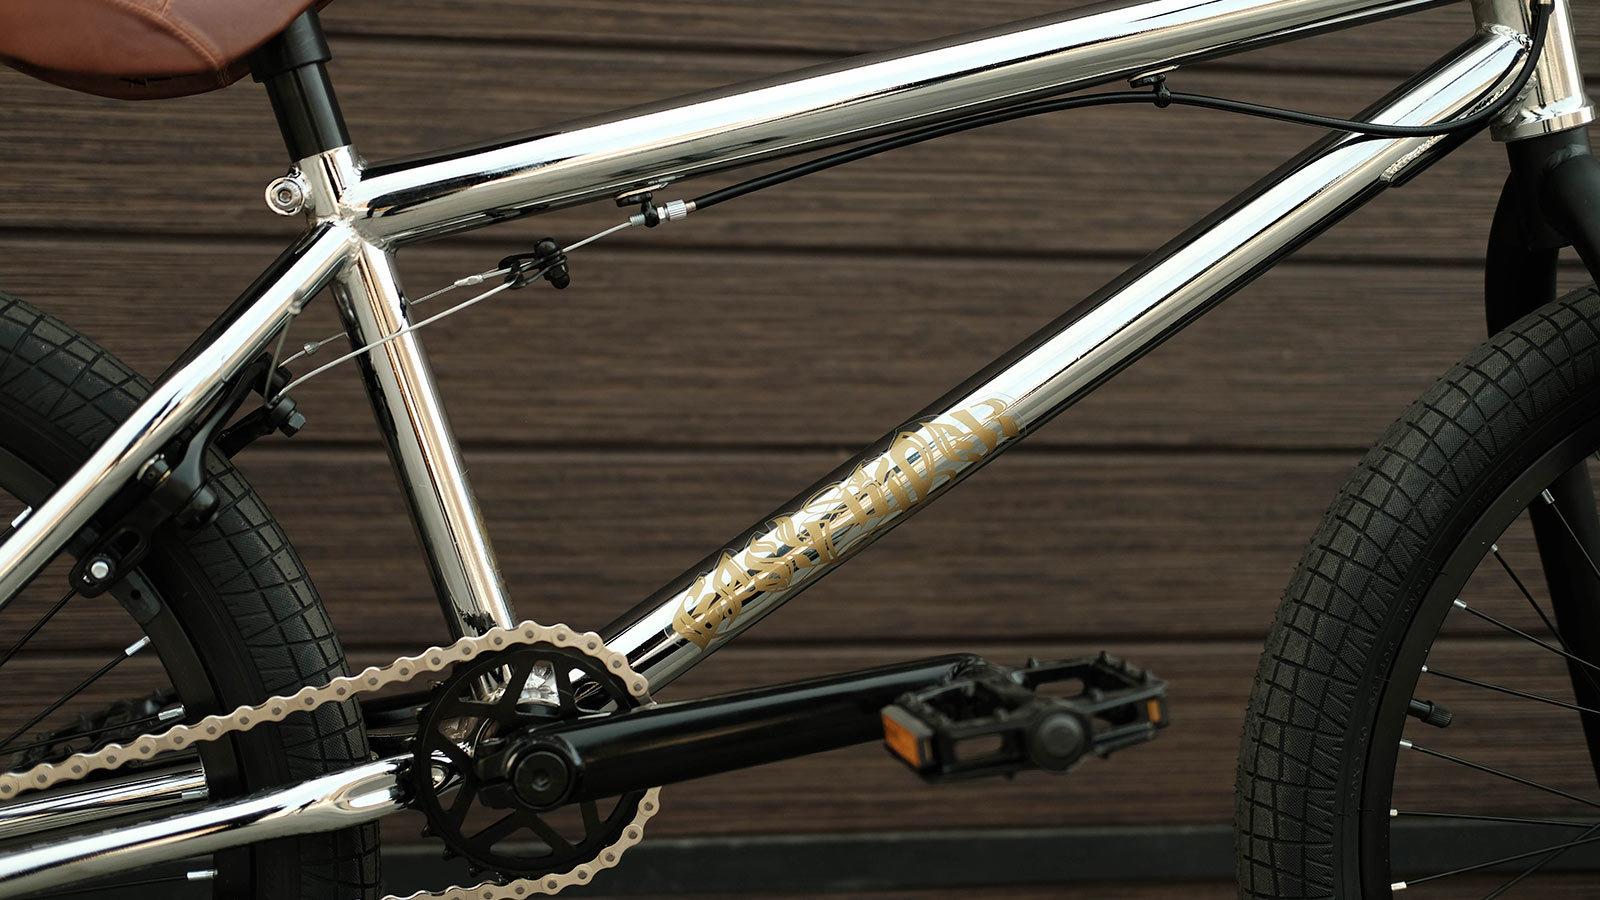 рама bmx трюковой велосипед